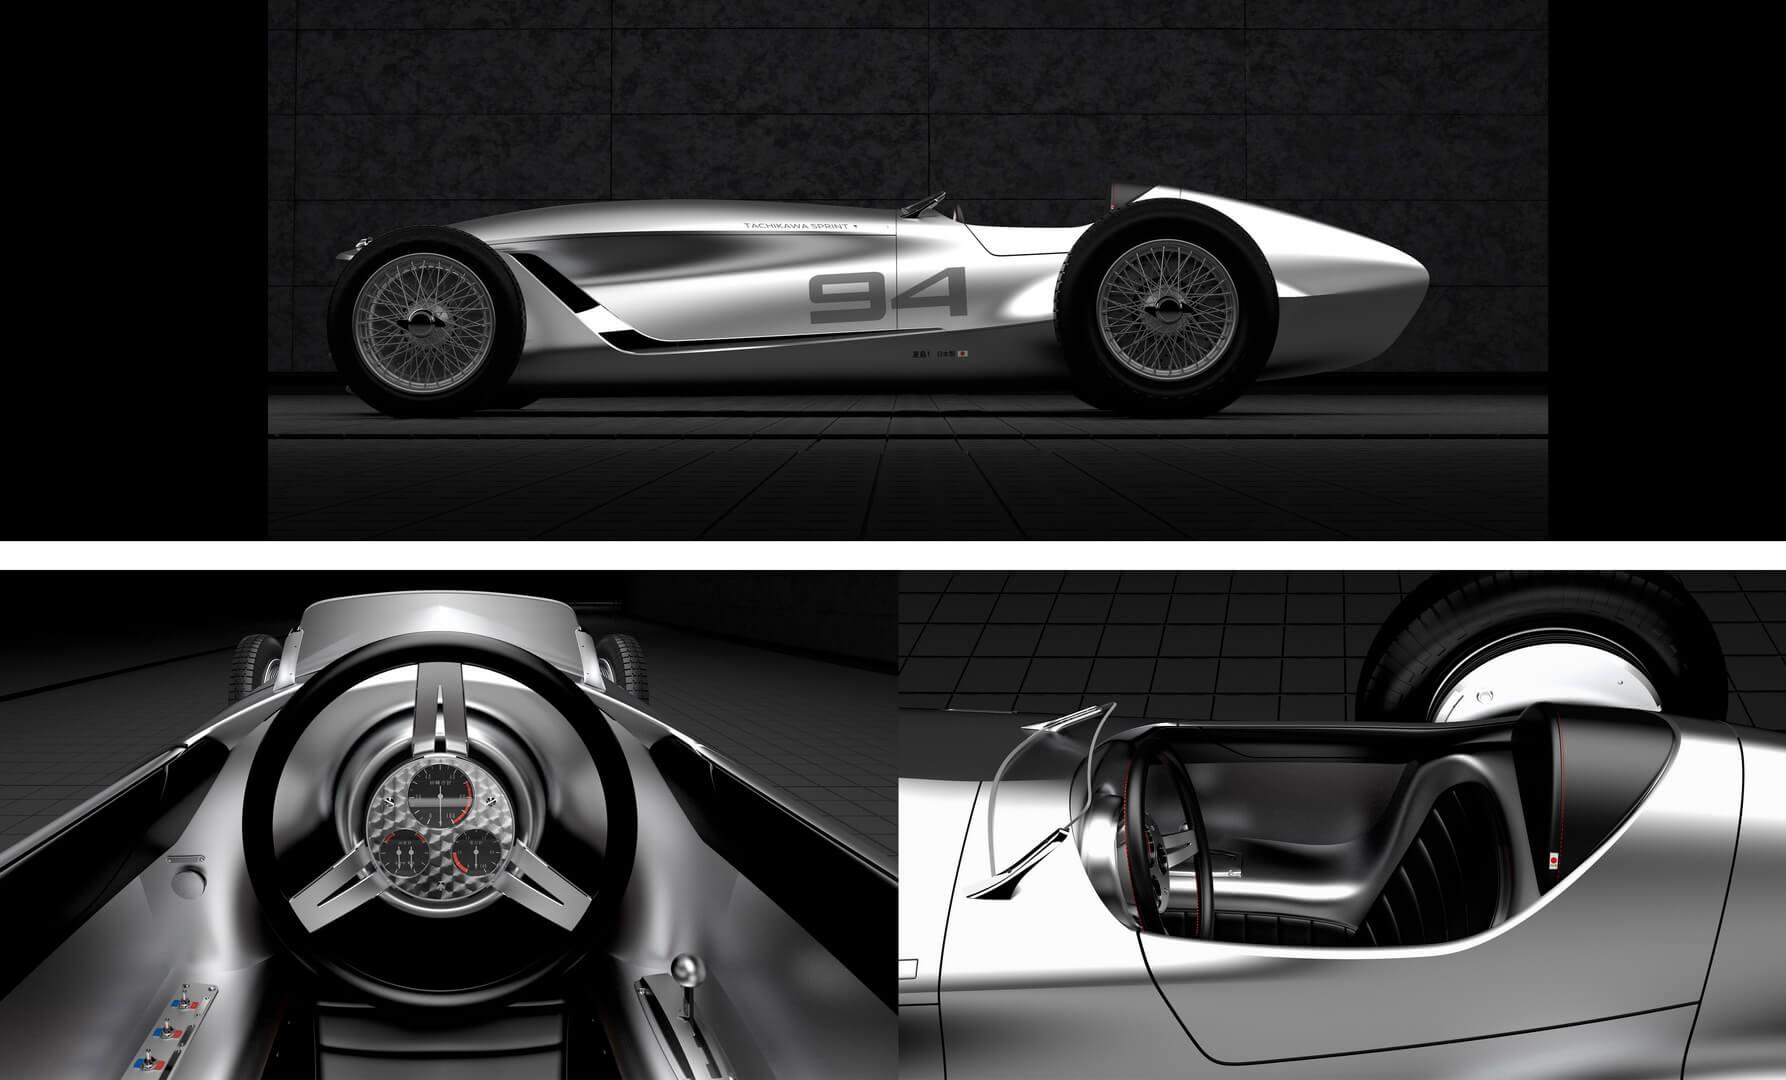 Дизайн электрического спорткара Prototype 9